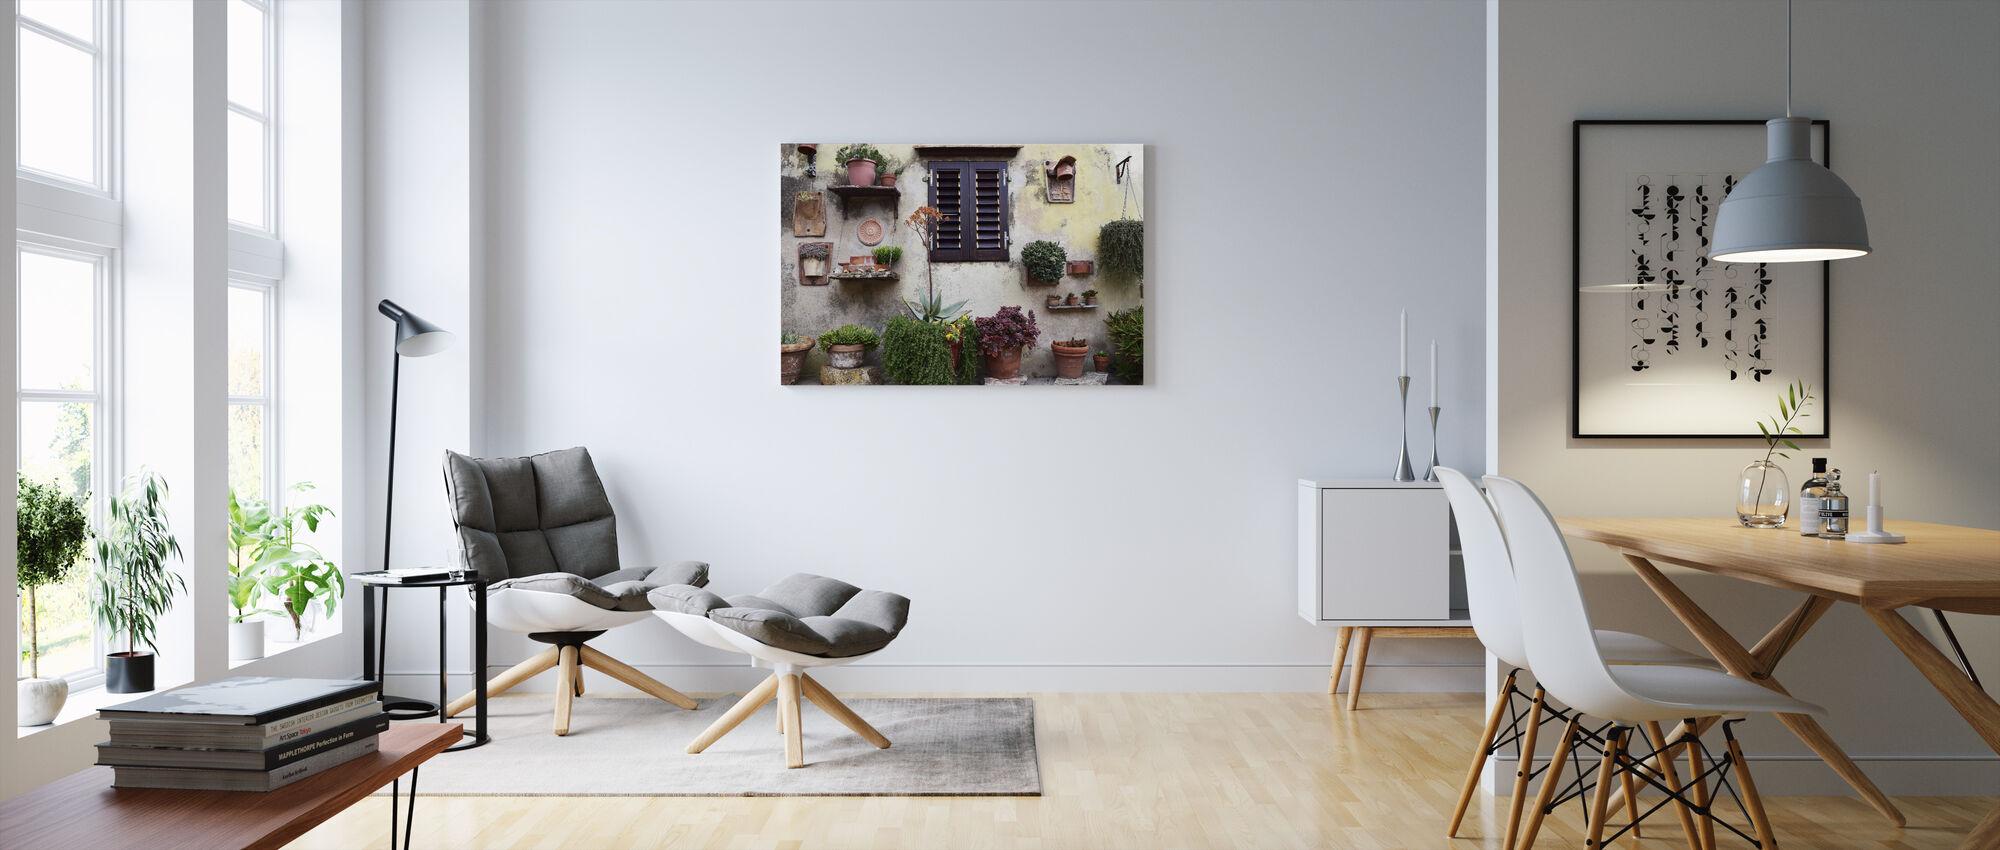 Bakgård blomma samling - Canvastavla - Vardagsrum